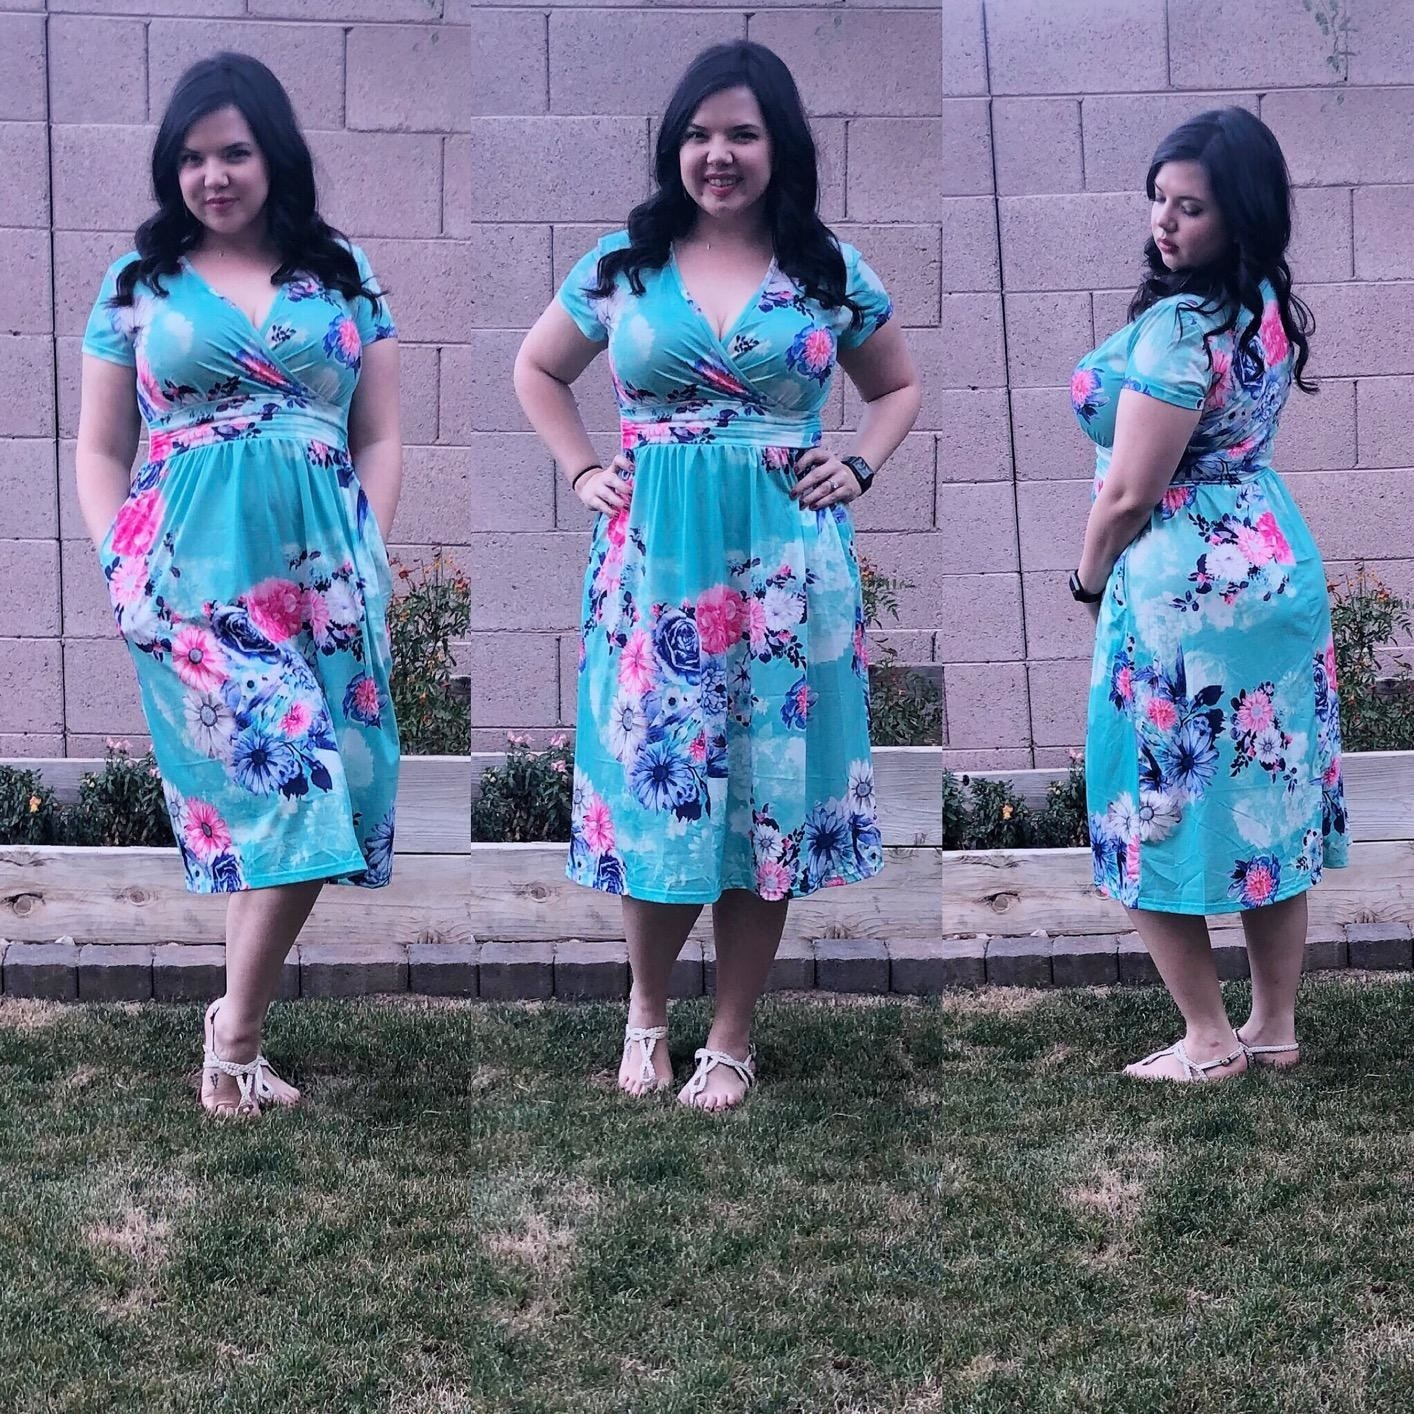 The dress in a light blue pattern